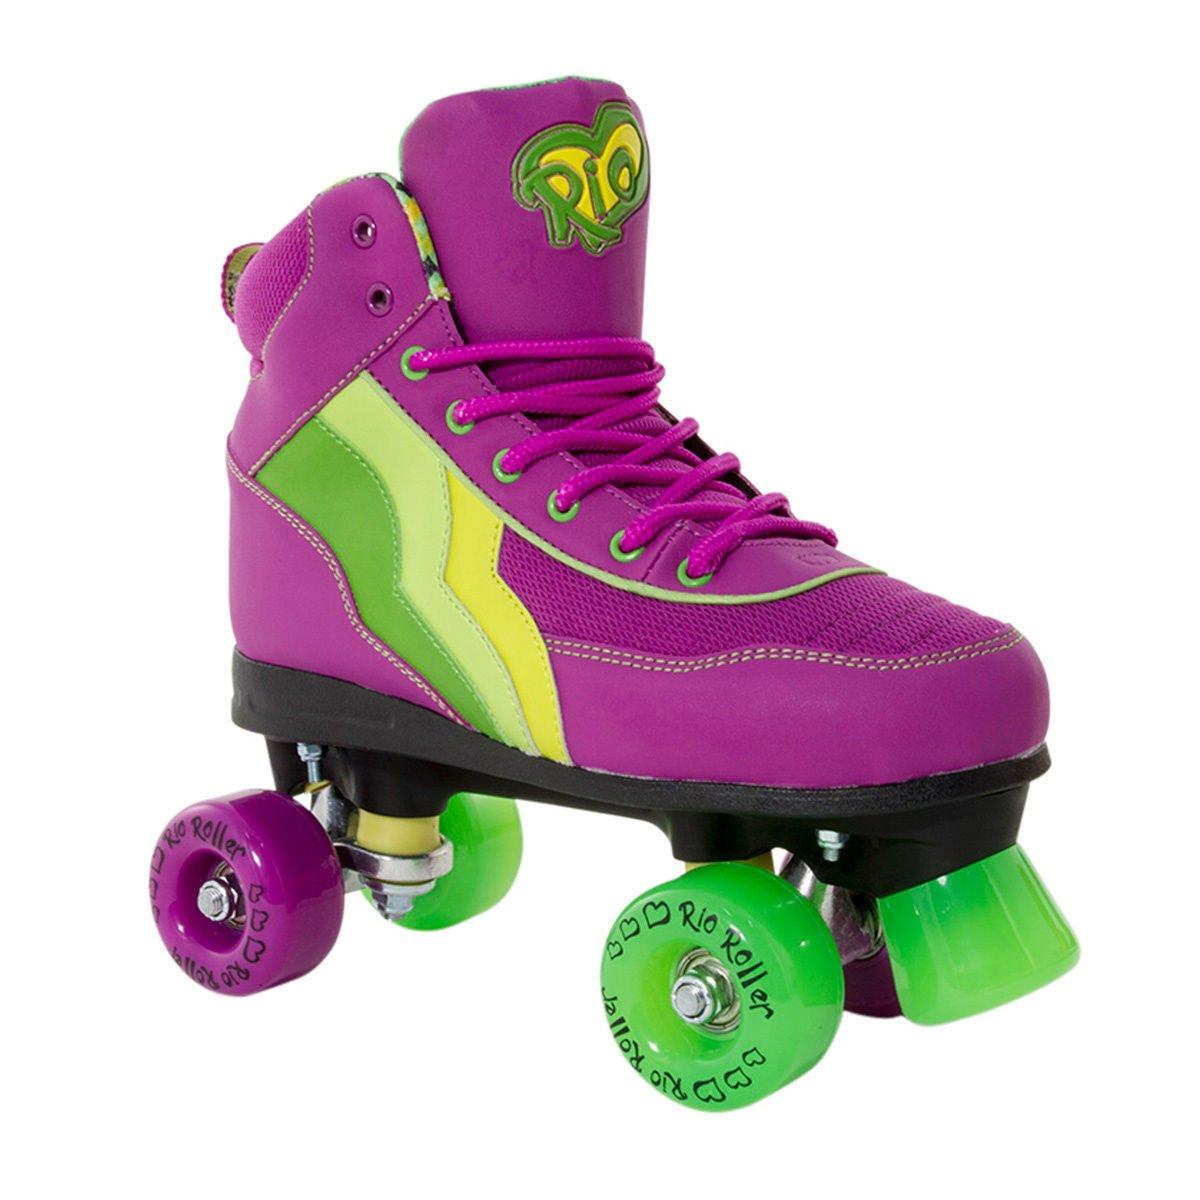 Quad roller skates amazon - Rio Roller Classic Ii Disco Roller Skates Various Colours Amazon Co Uk Sports Outdoors